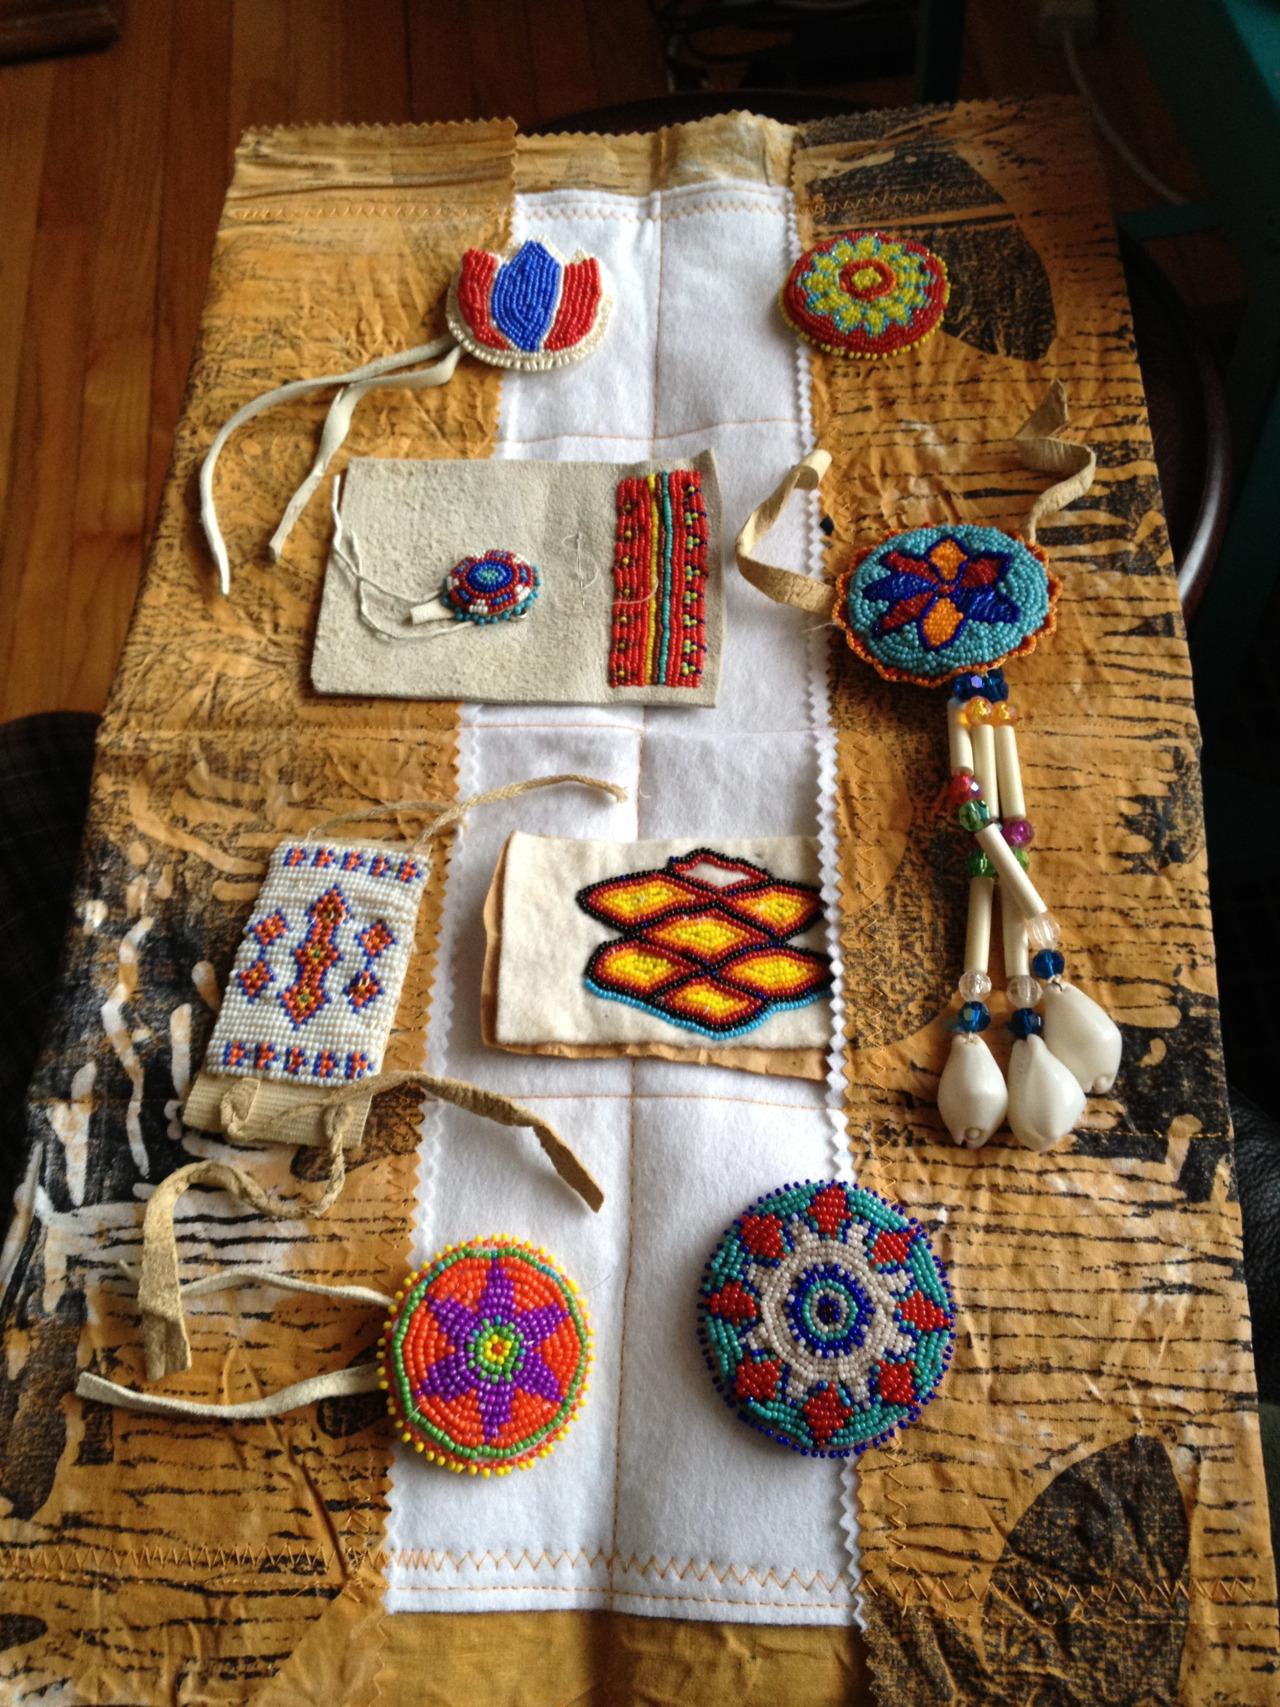 hybridpress: Kaku's (grandmothers) bead work.